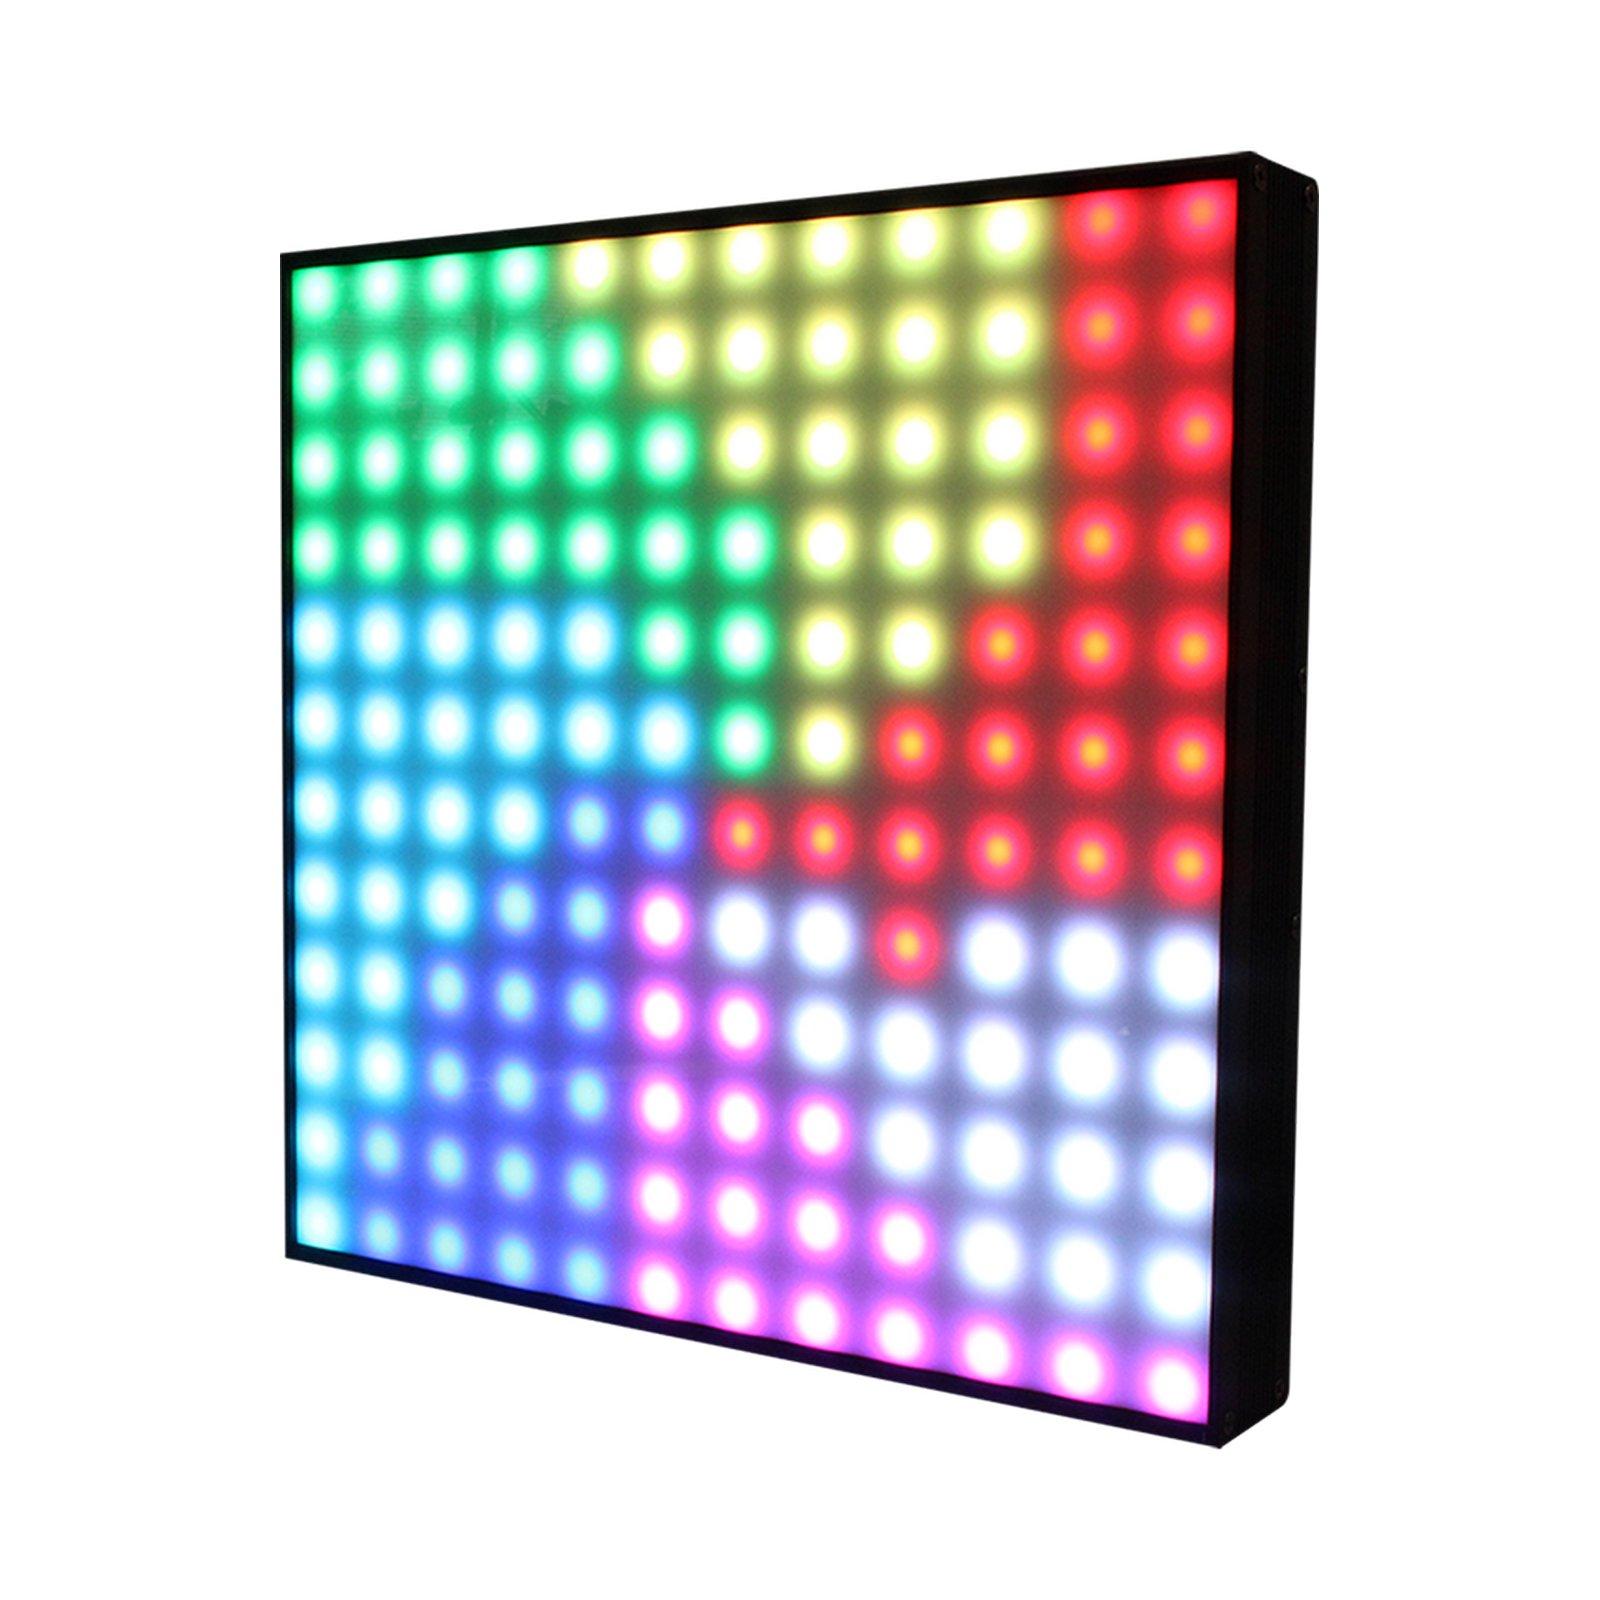 Blizzard Lighting Pixellicious 2 | 12x12 RGB LED Matrix Video Panel